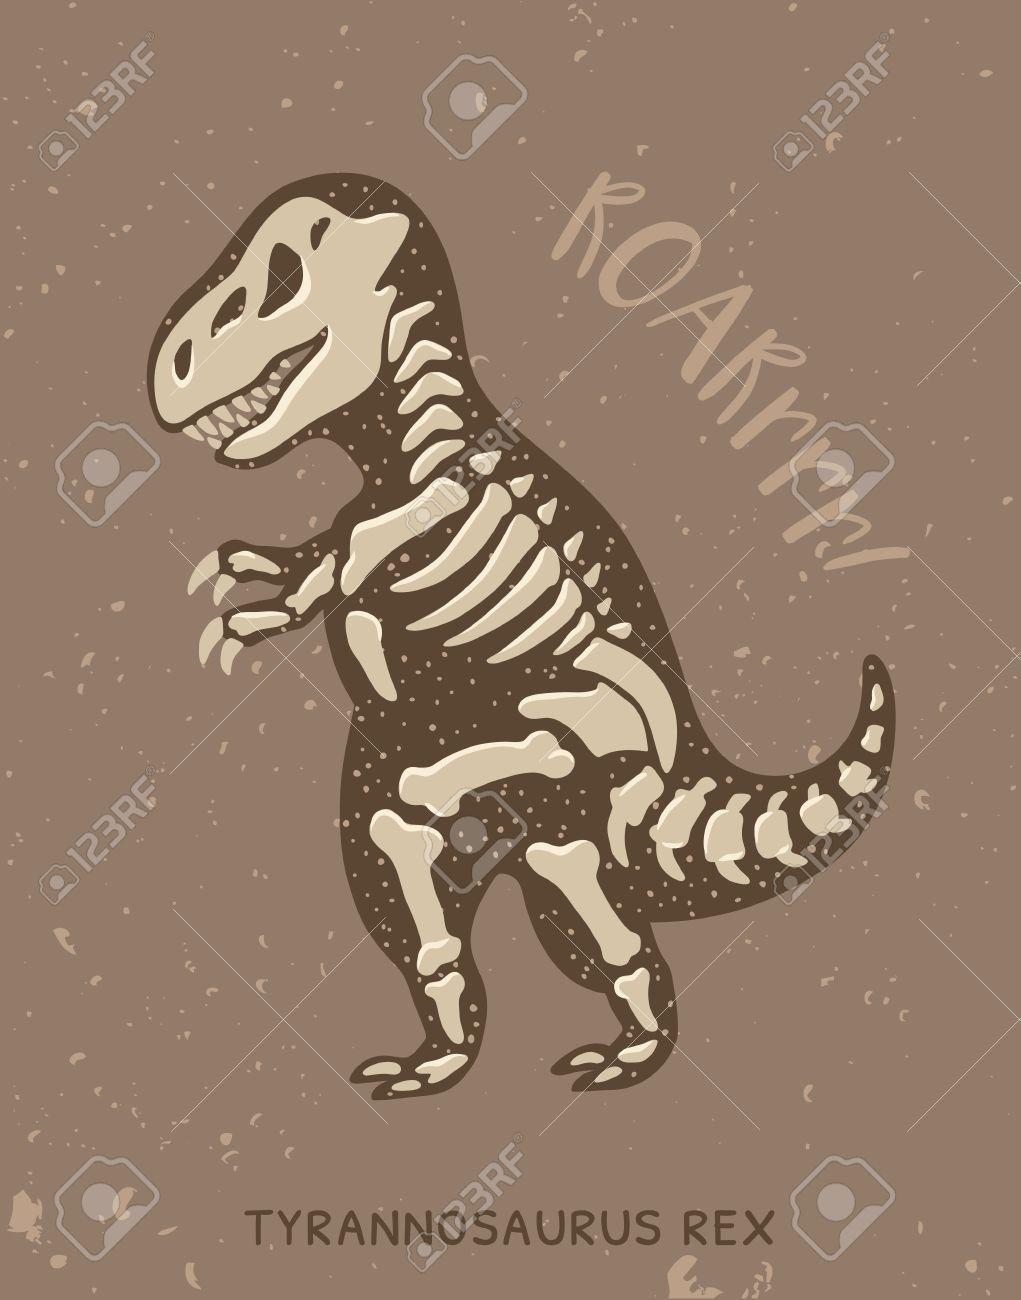 1021x1300 Cartoon Card With A Tyrannosaurus Rex Skeleton And Text Roar